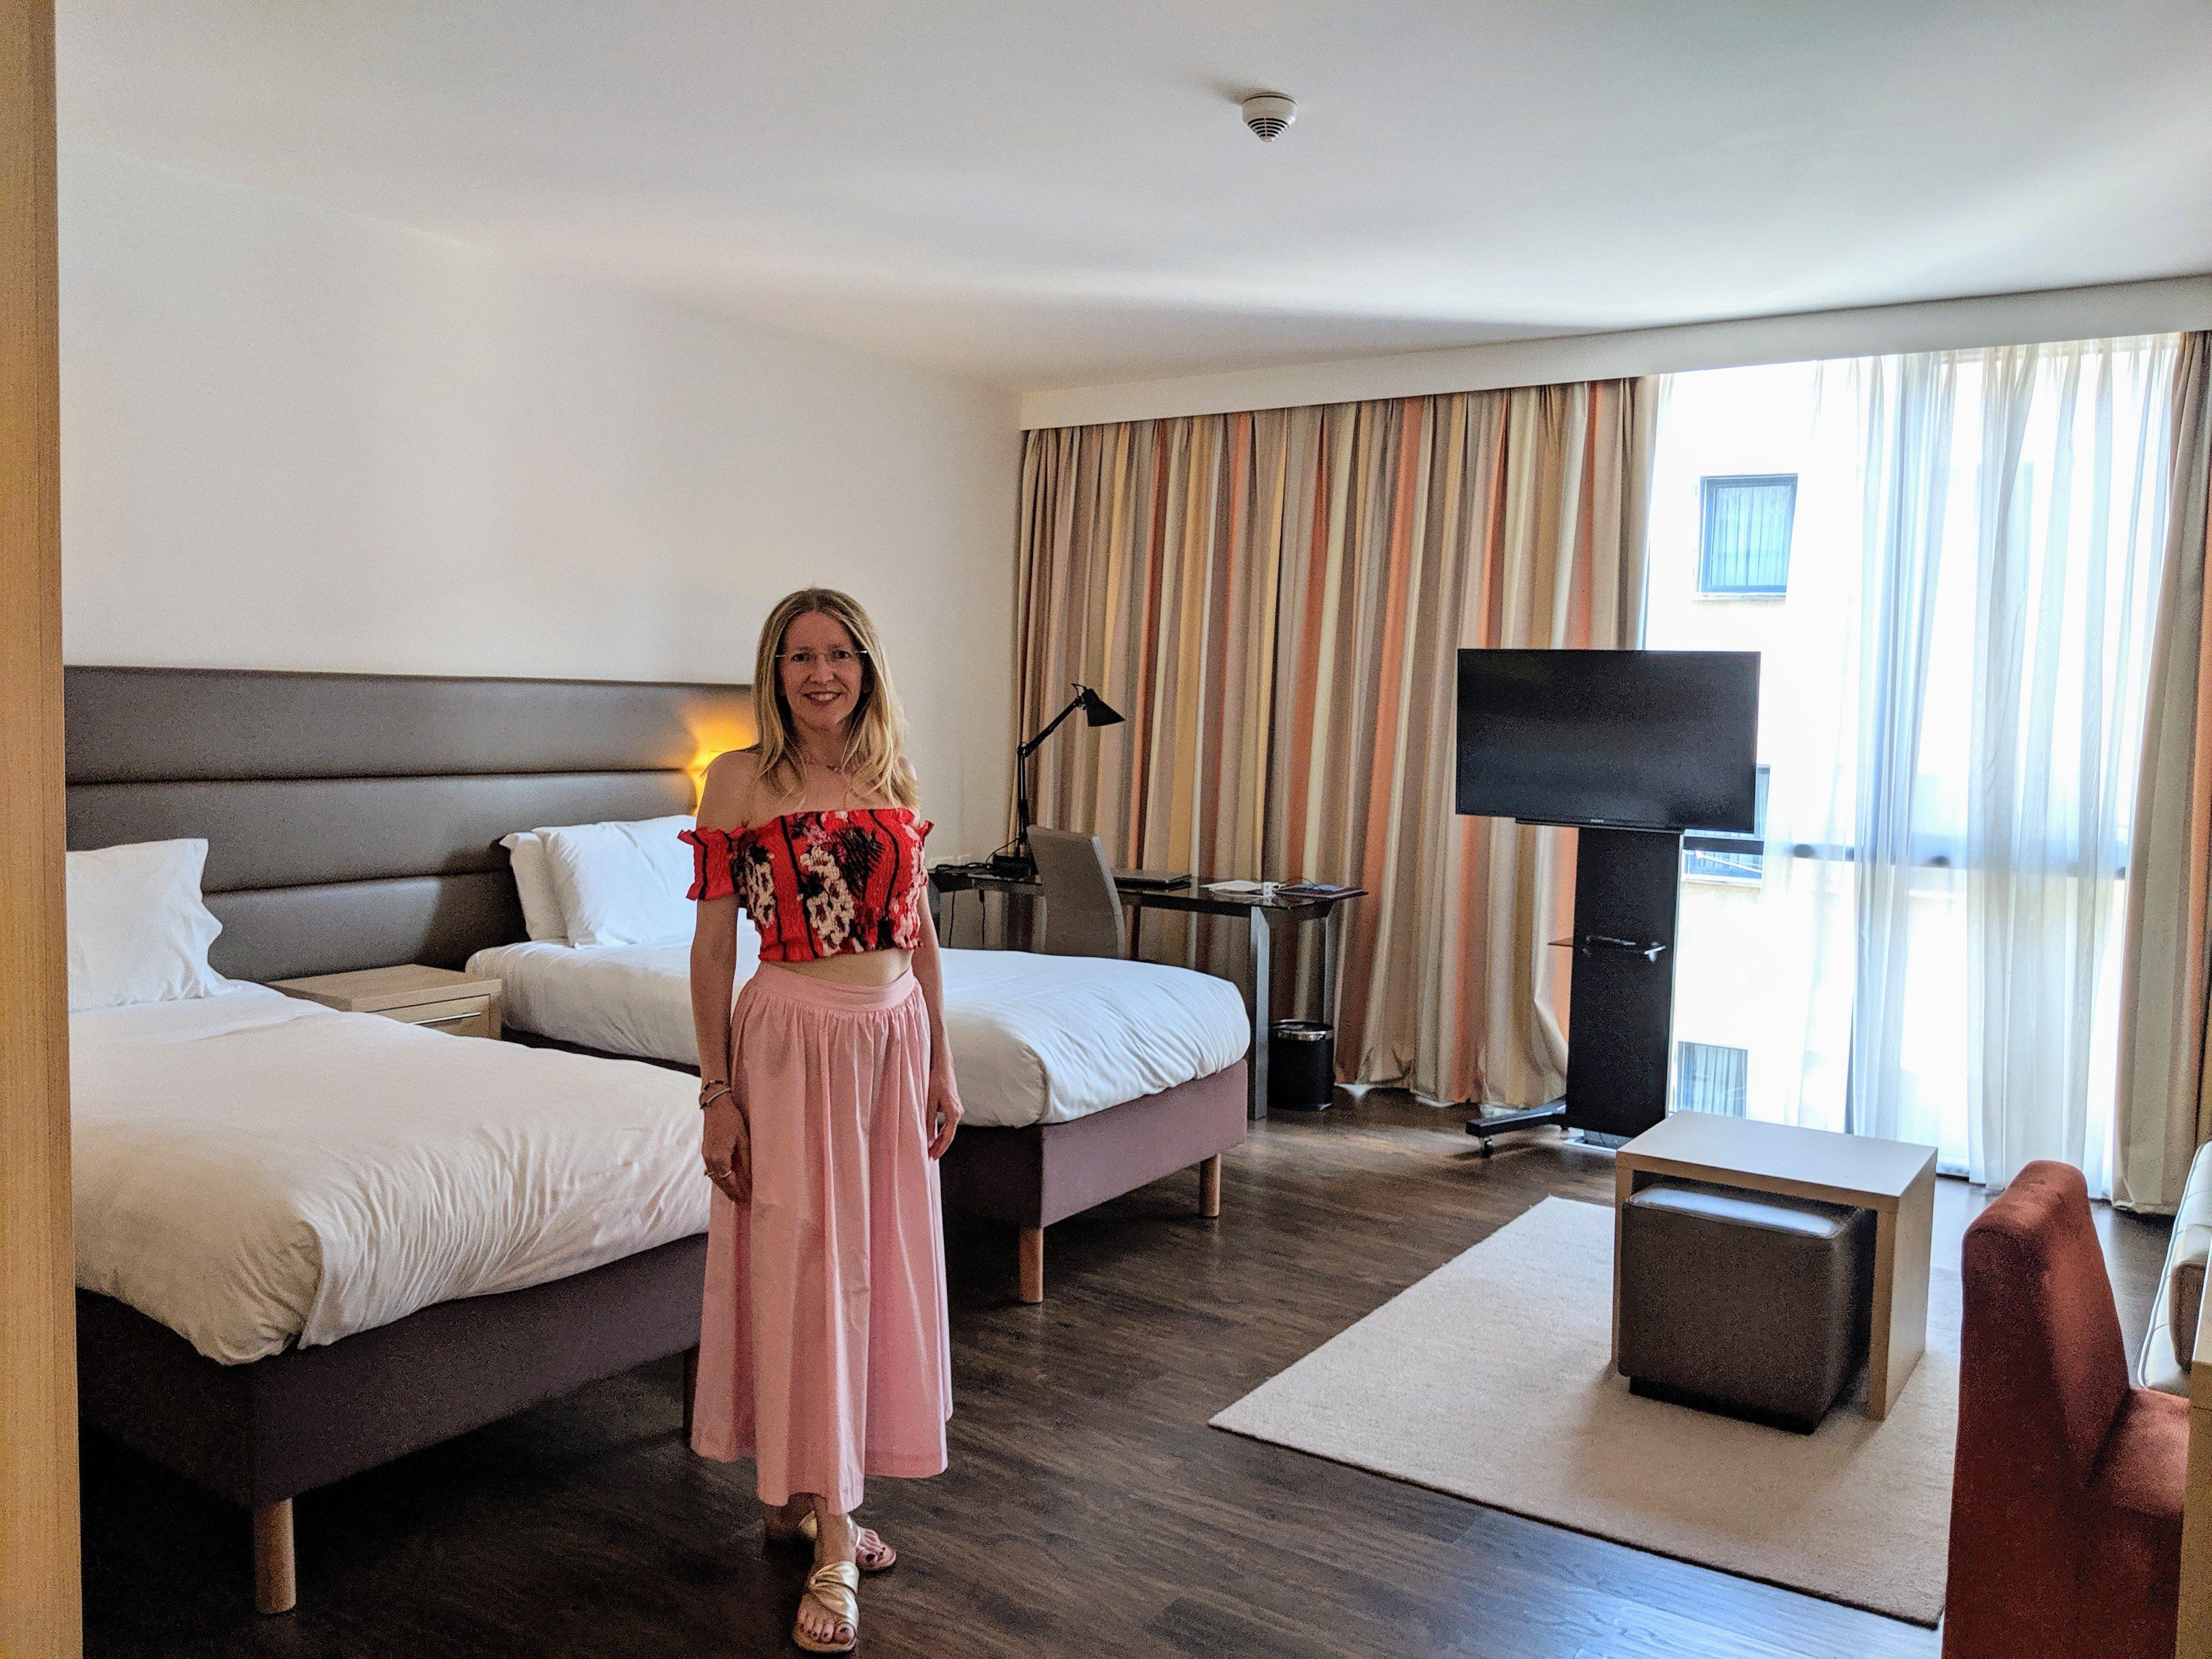 Camera del Residence Inn by Marriott a Sarajevo